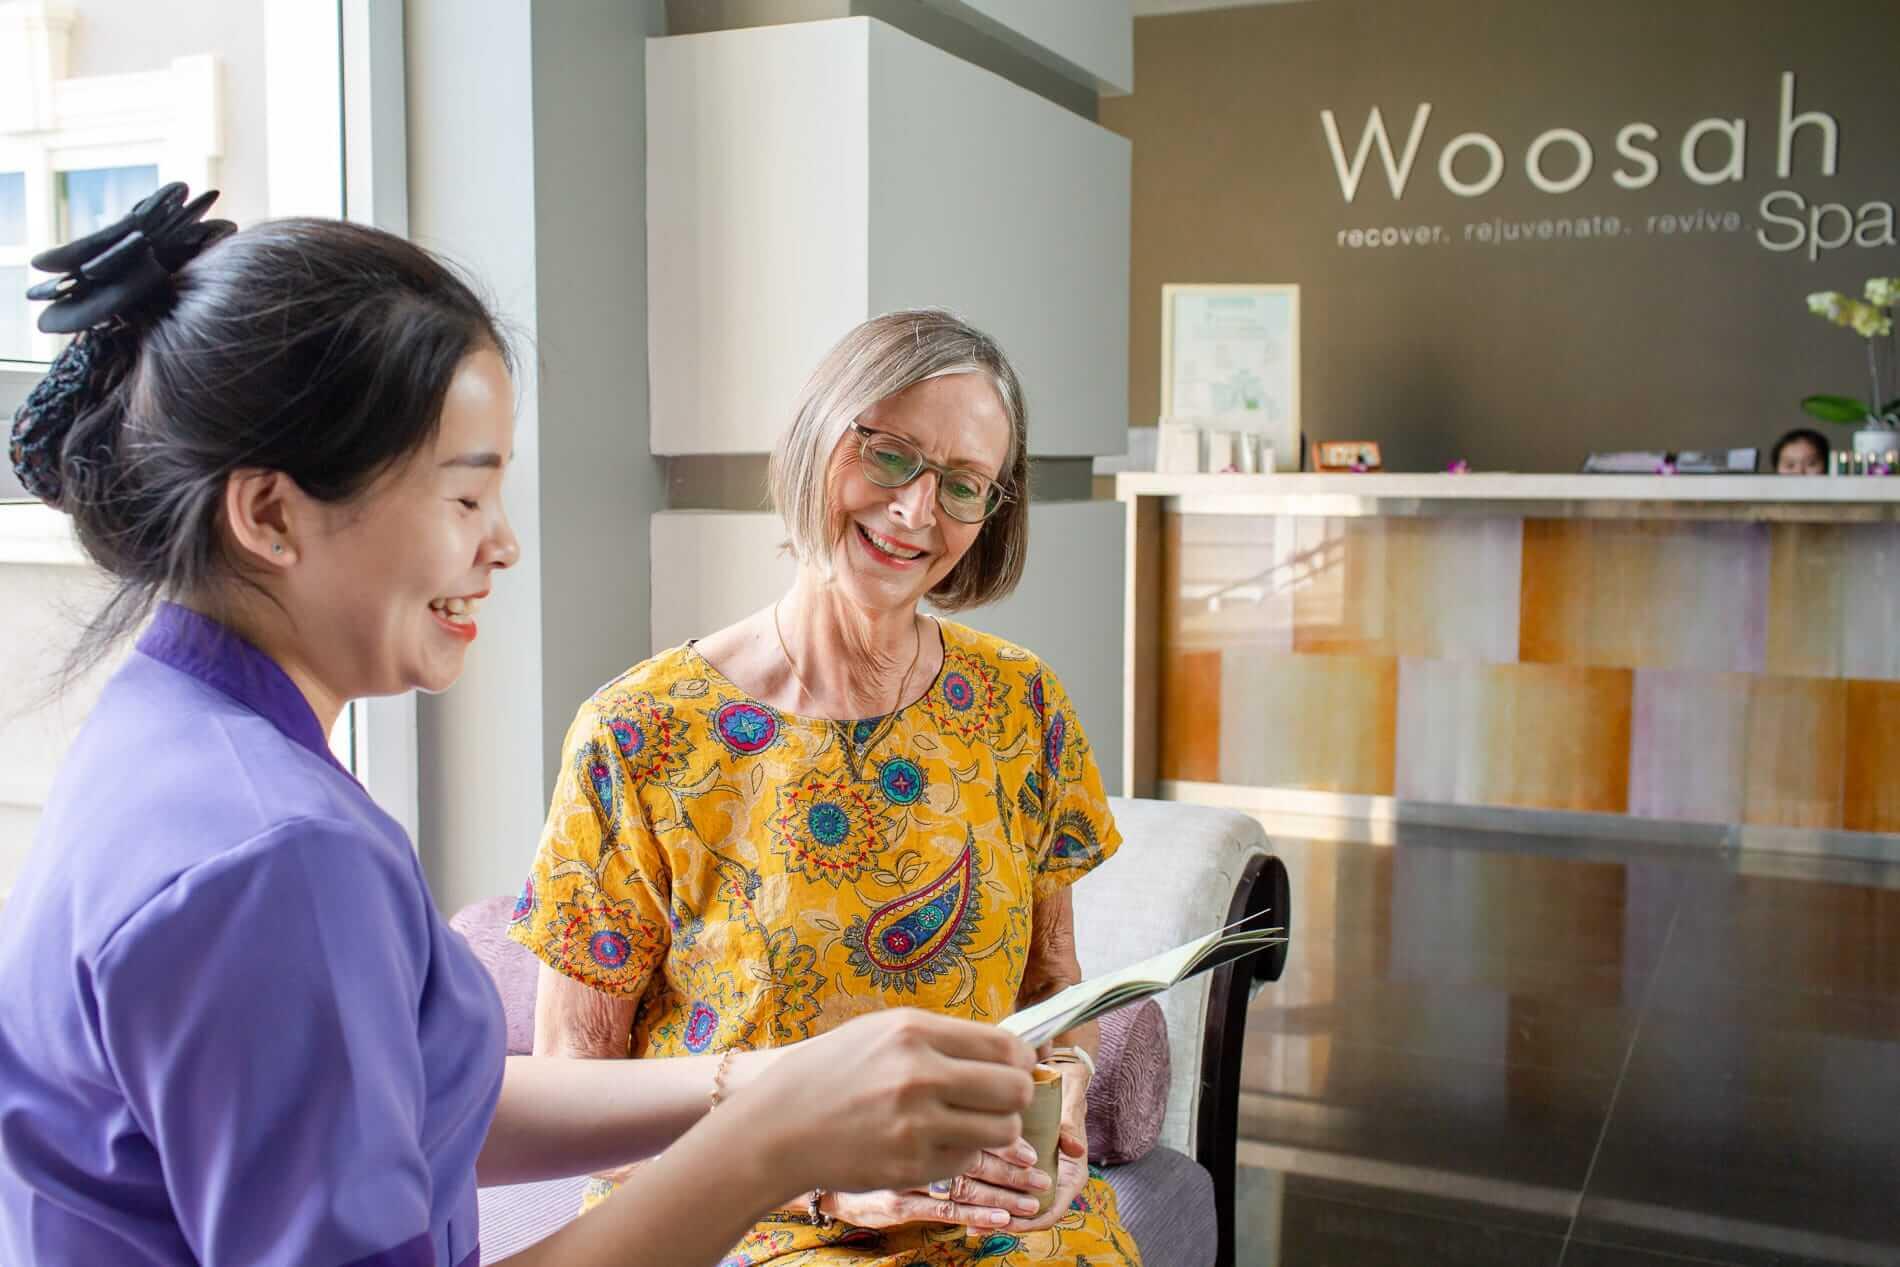 Checking the offers at Woosah Spa